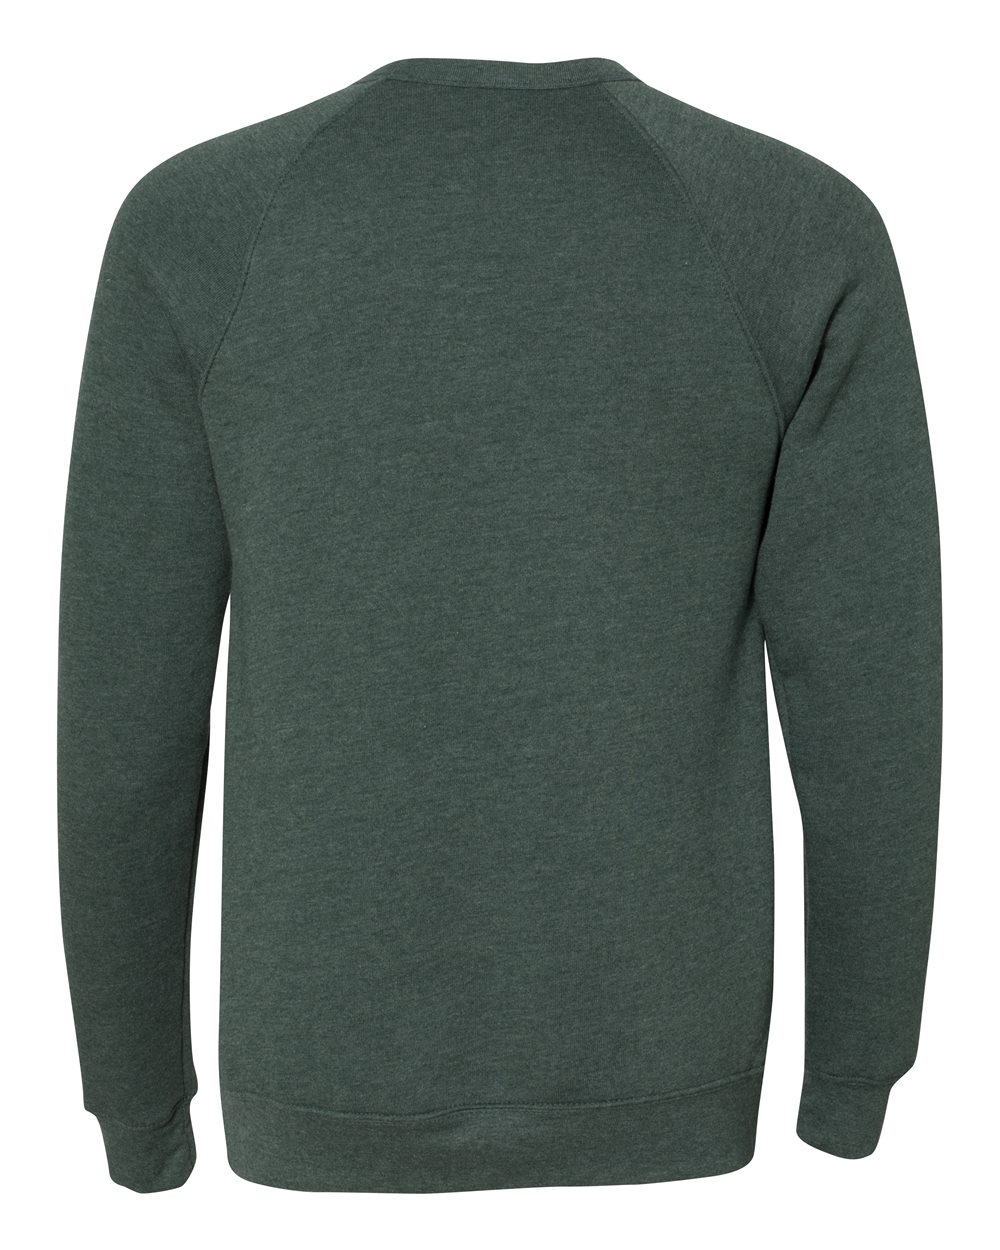 Bella-Canvas-Unisex-Sponge-Fleece-Crewneck-Sweatshirt-Top-Blank-3901-up-to-2XL thumbnail 36